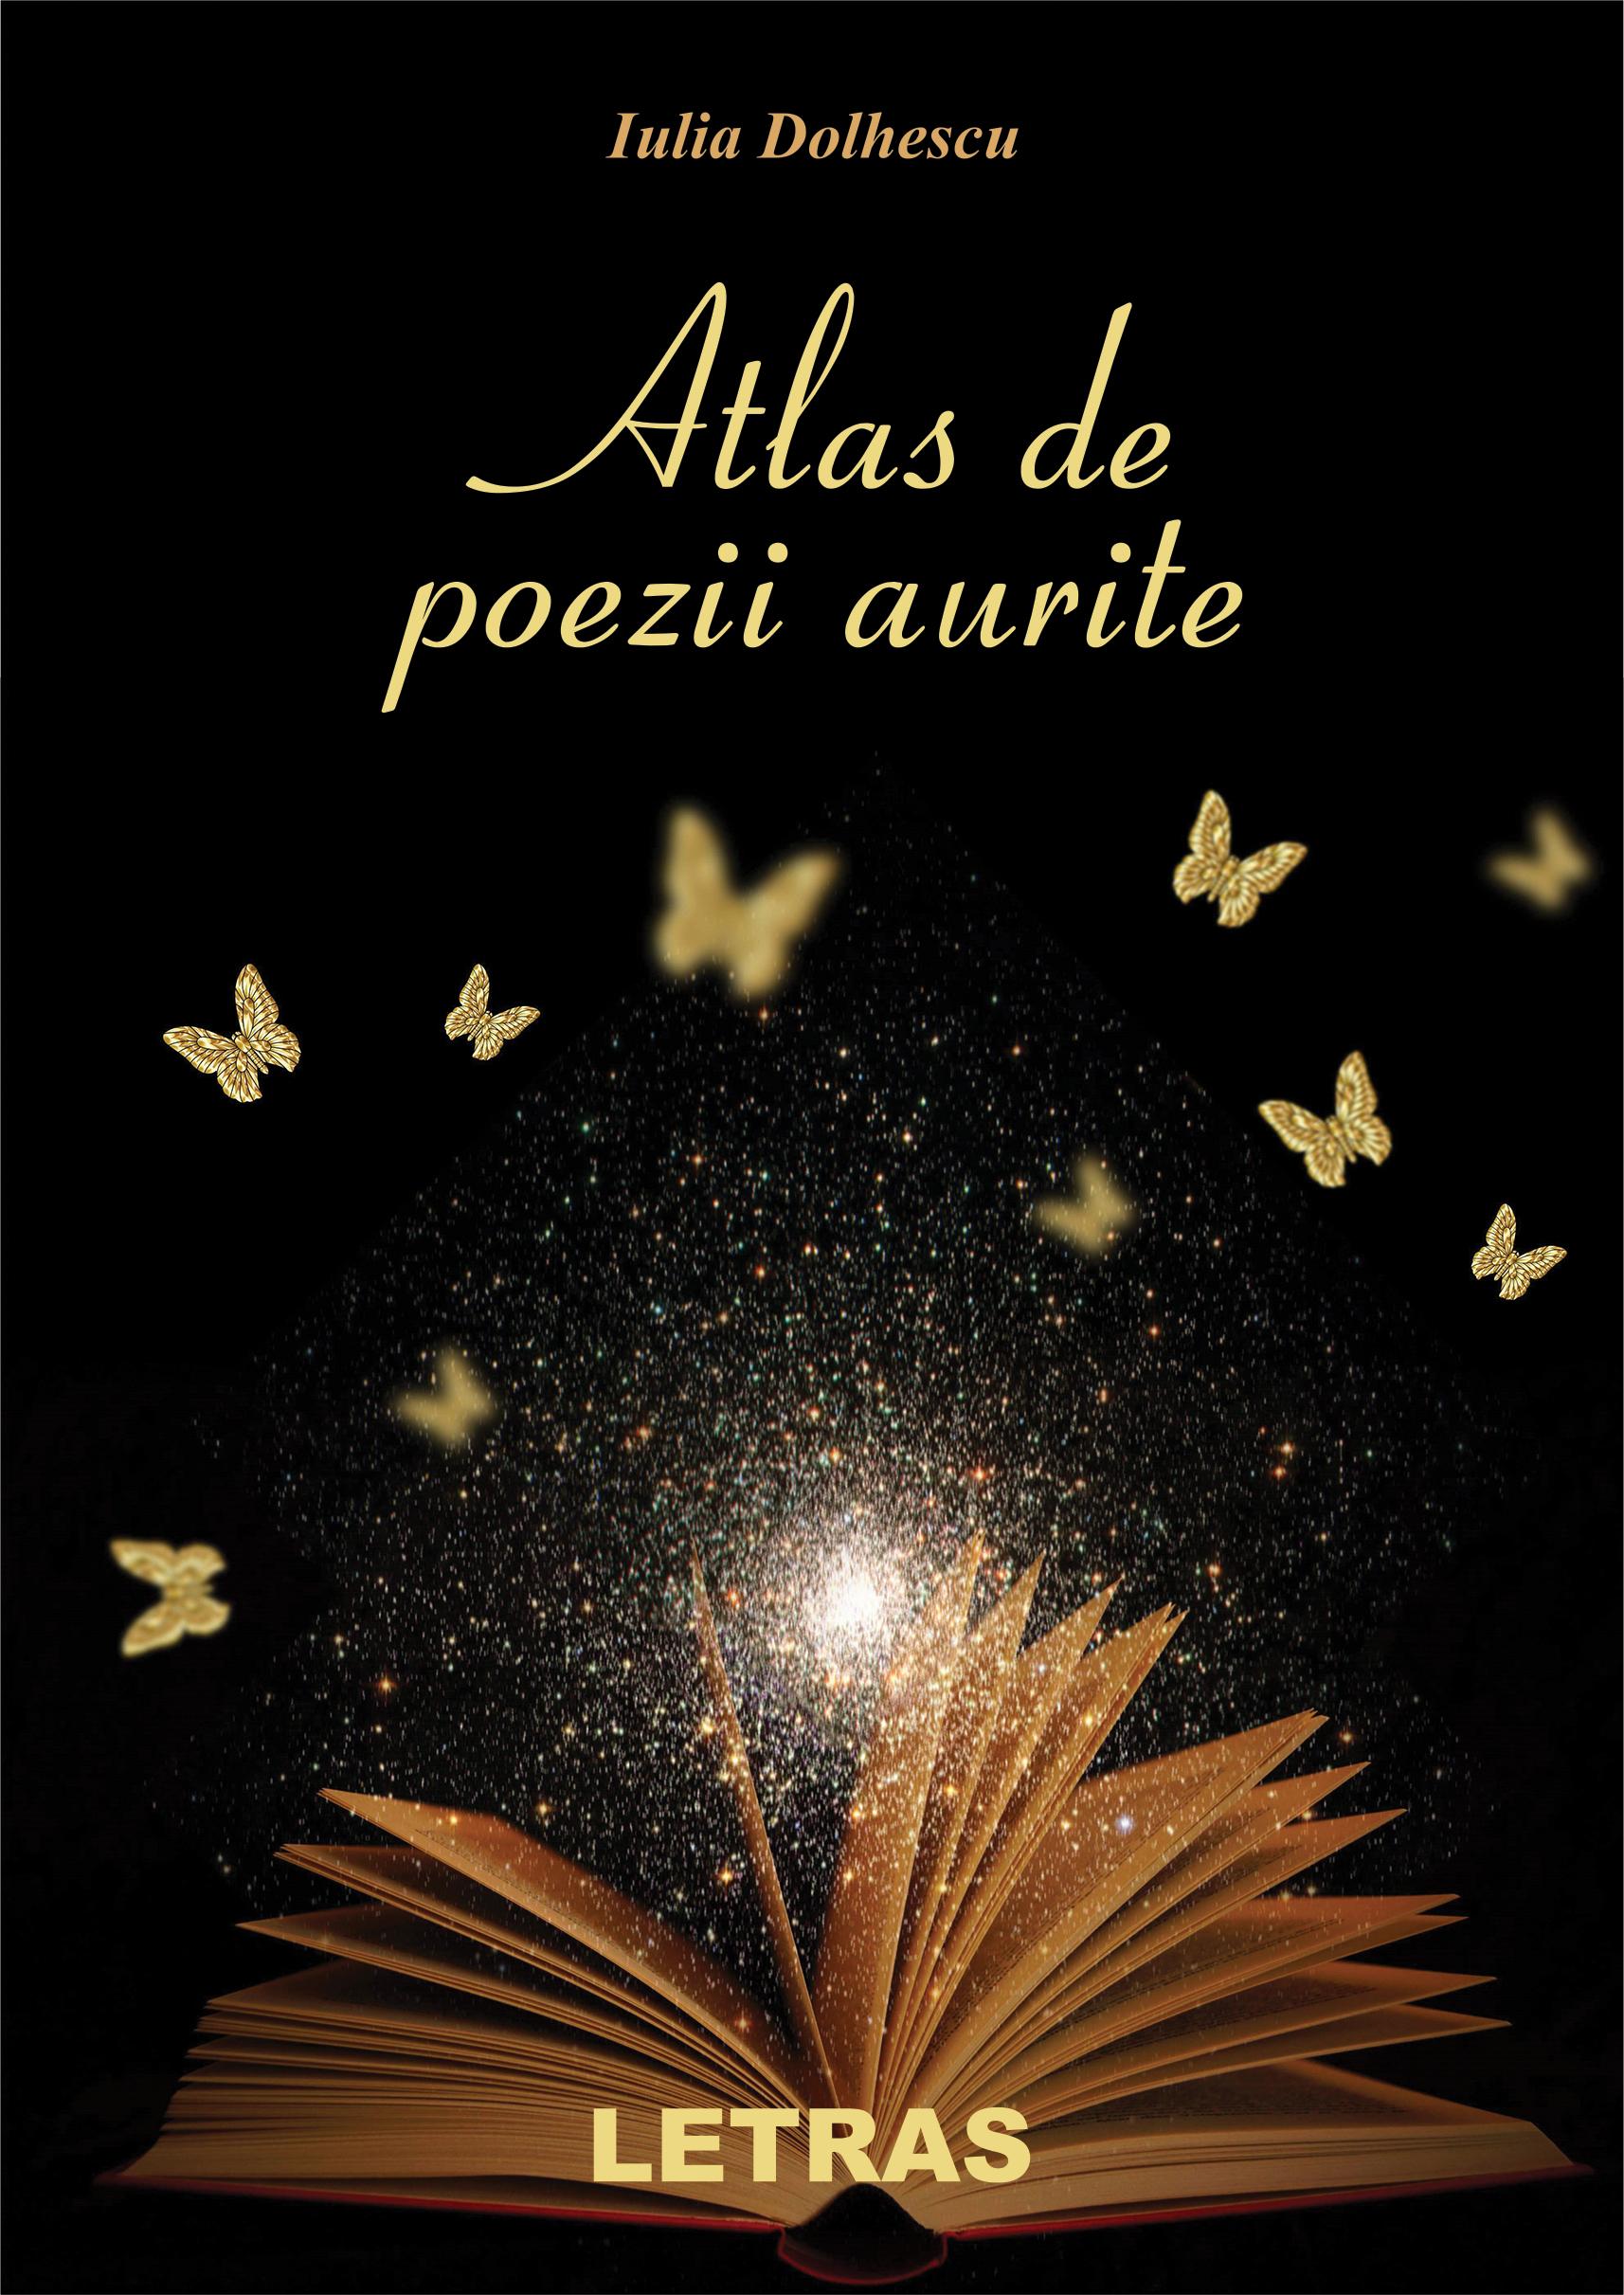 Dolhescu Iulia_Atlas de poezii aurite_coperta 1_300 dpi_RGB